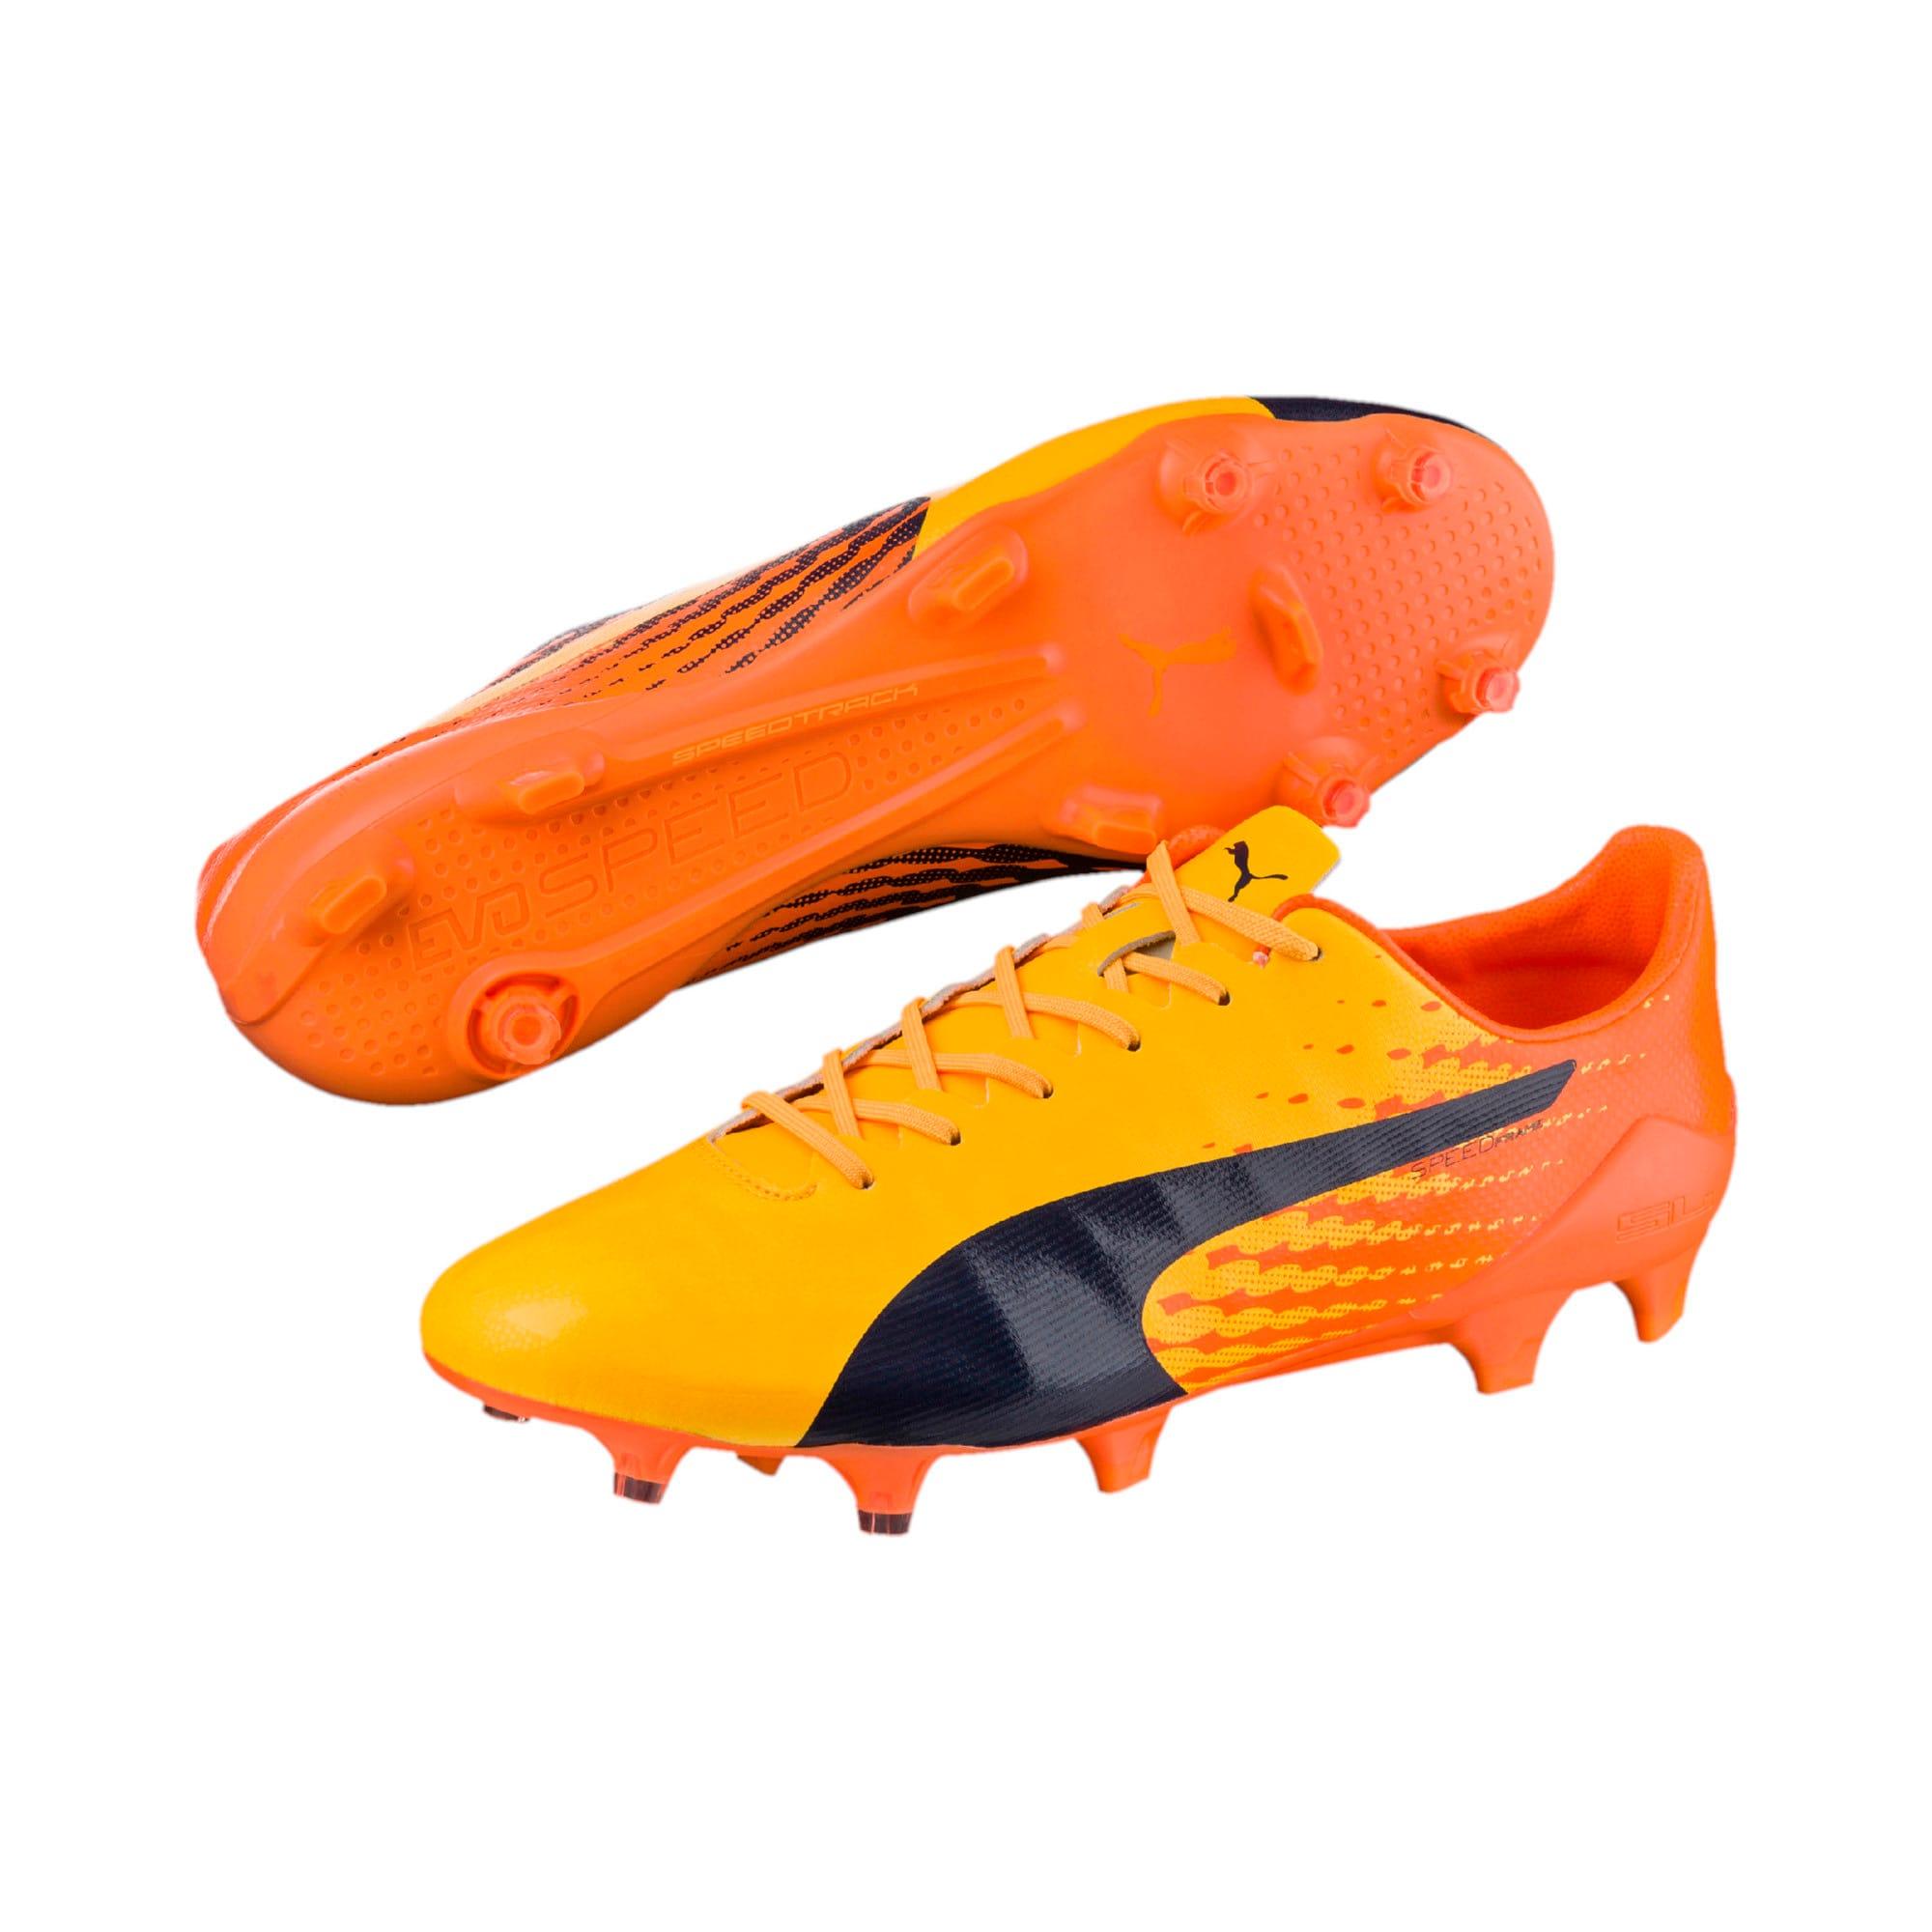 Thumbnail 7 of evoSPEED 17 SL-S FG Men's Football Boots, YELLOW-Peacoat-Orange, medium-IND